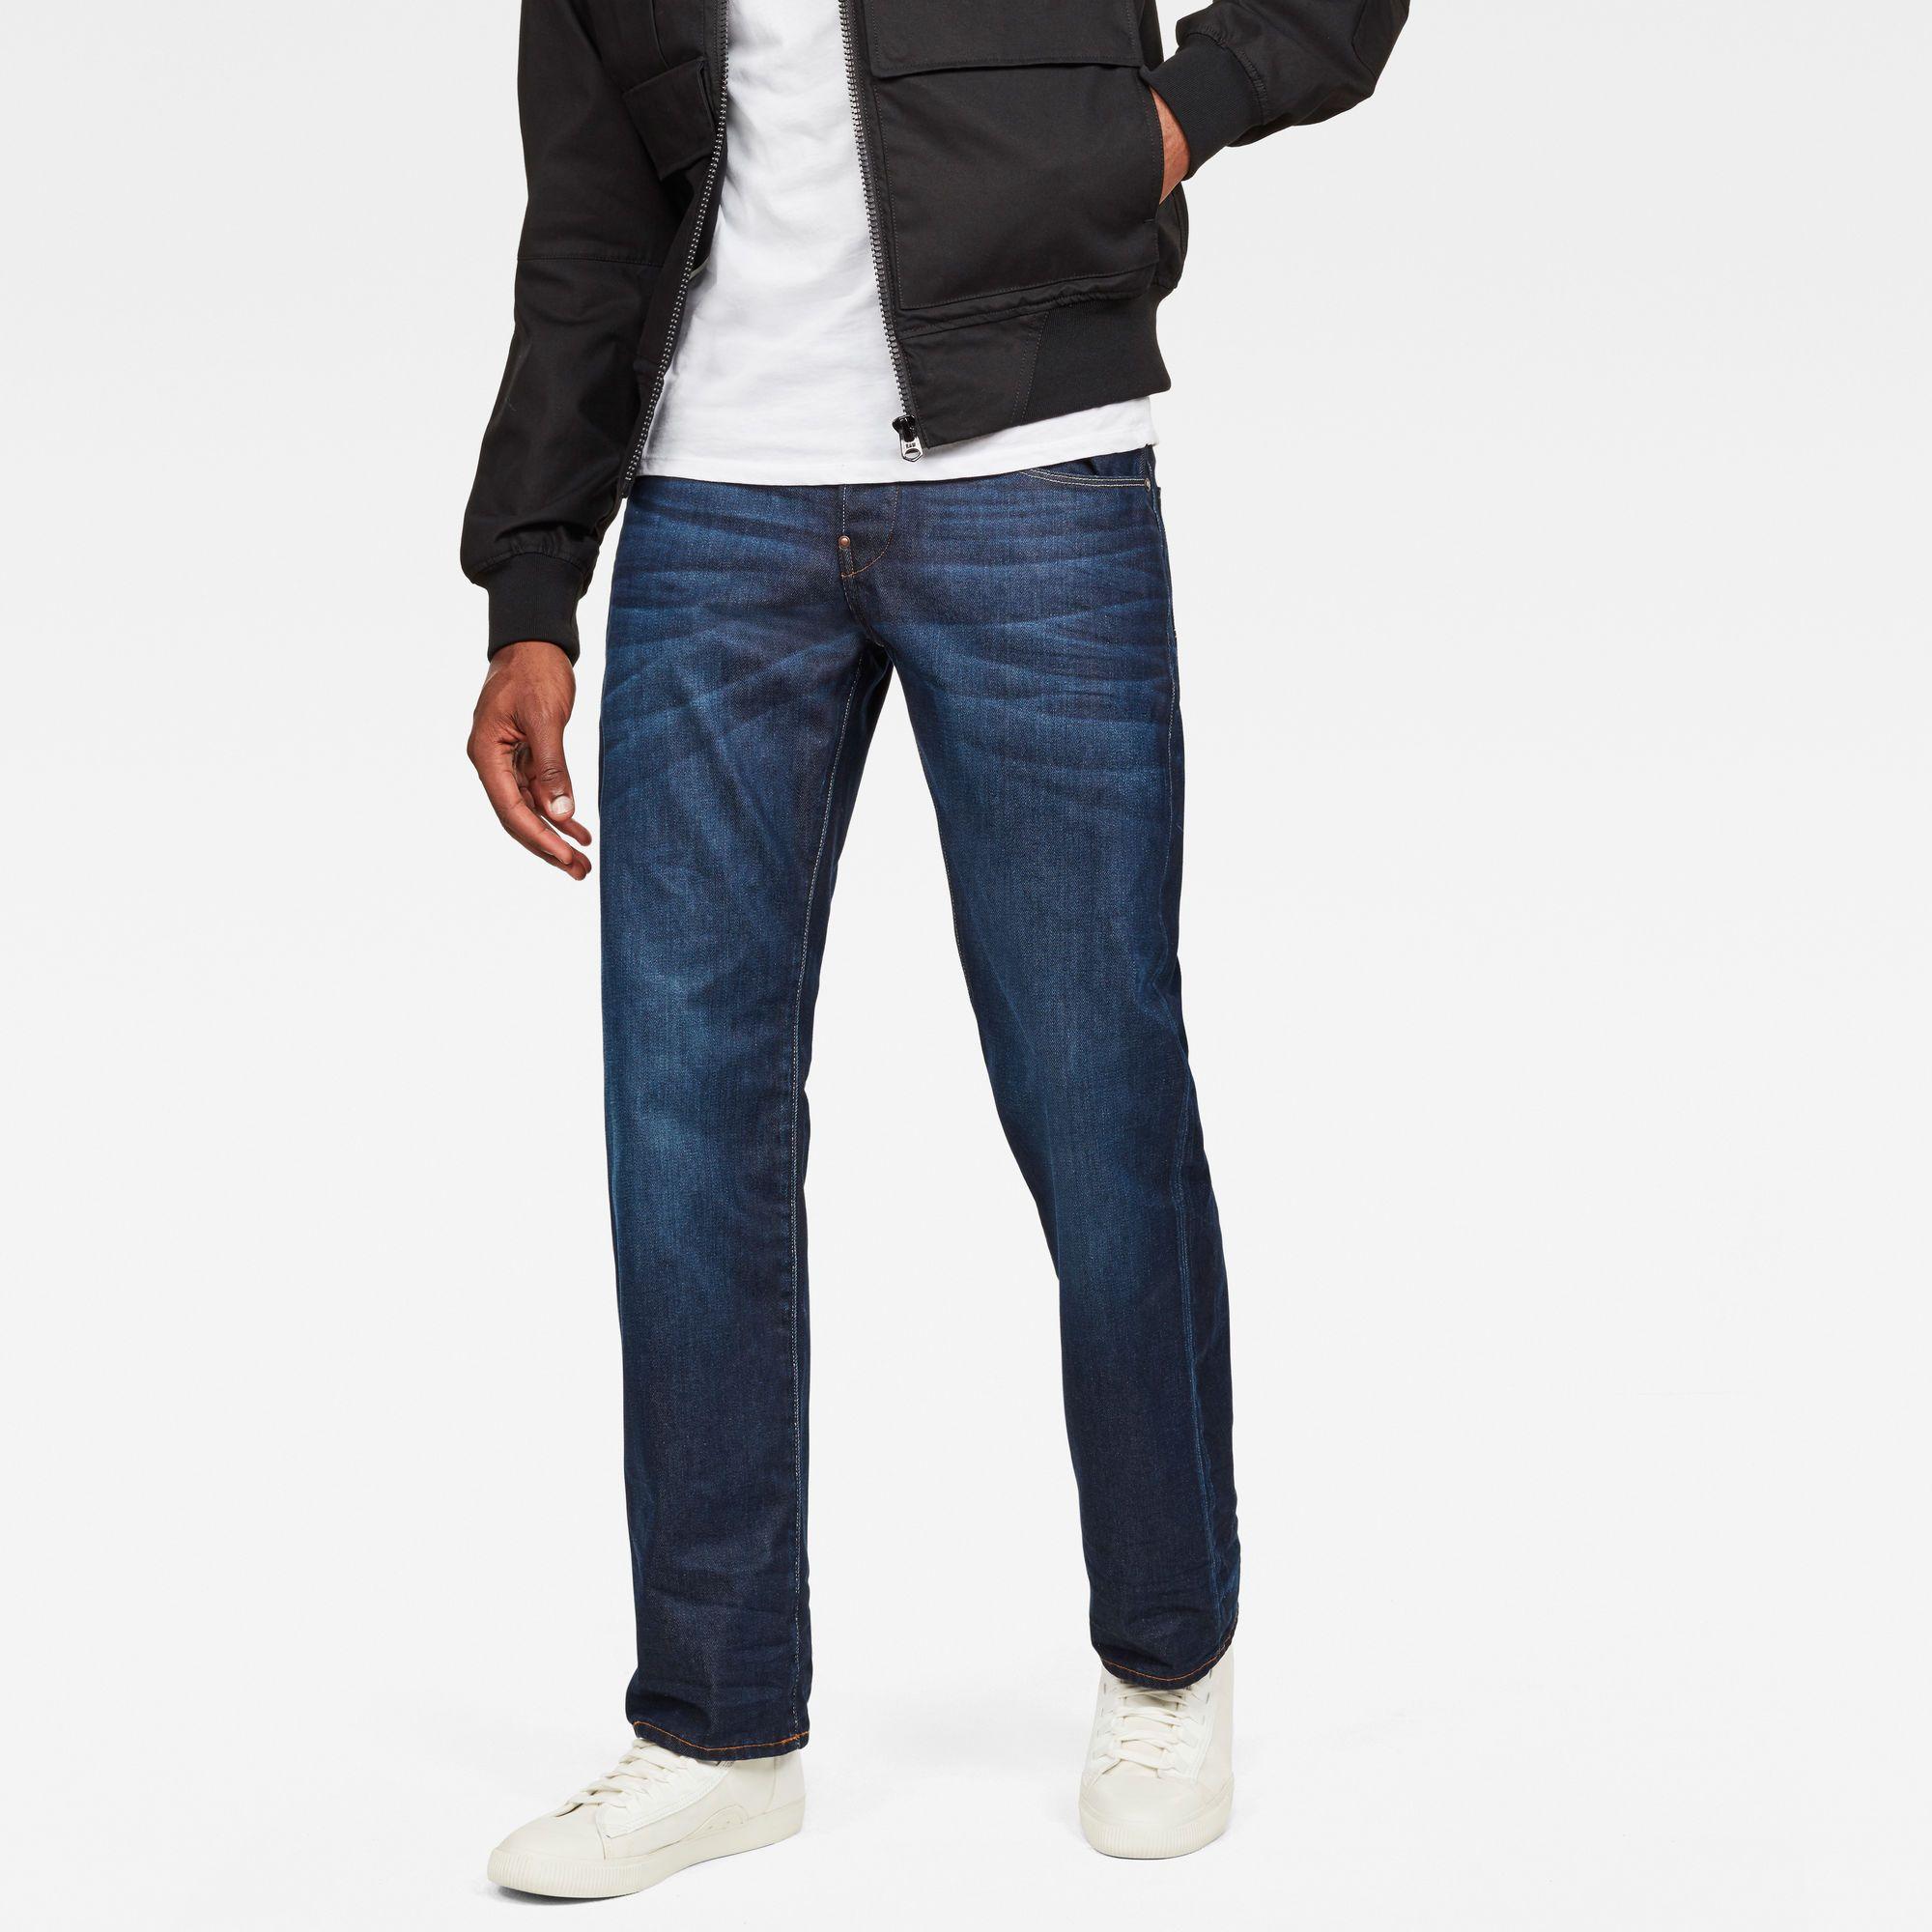 G-Star RAW Radar Loose Low Waist Jeans